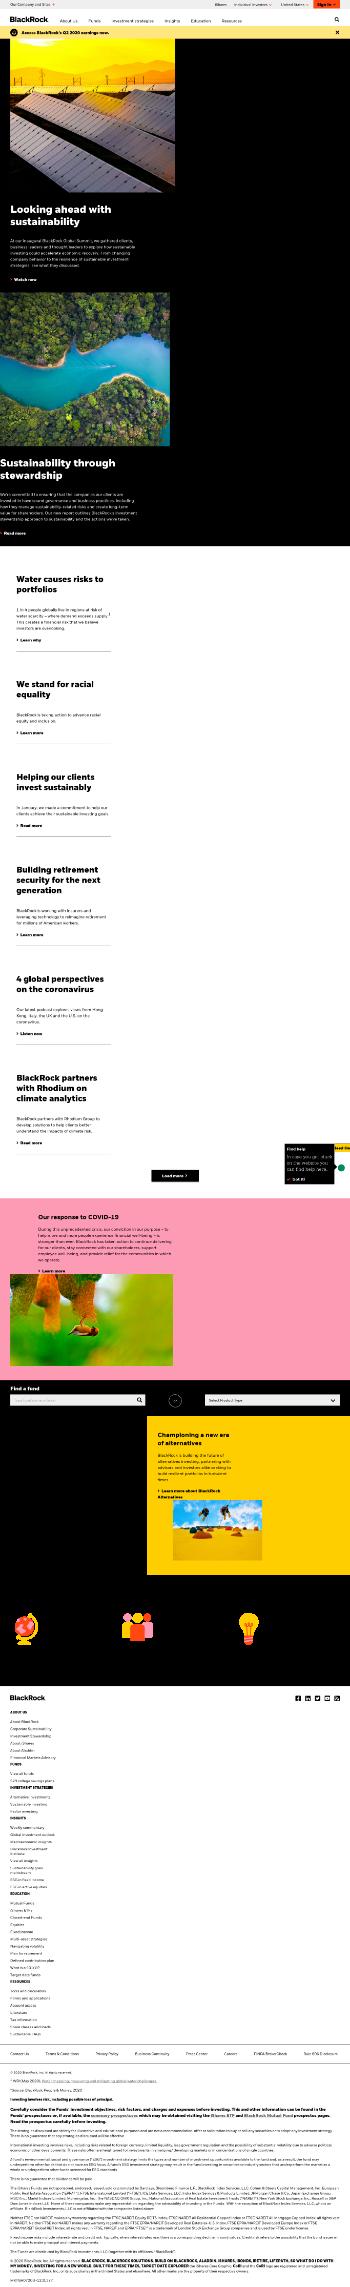 BlackRock MuniHoldings Fund, Inc. Website Screenshot